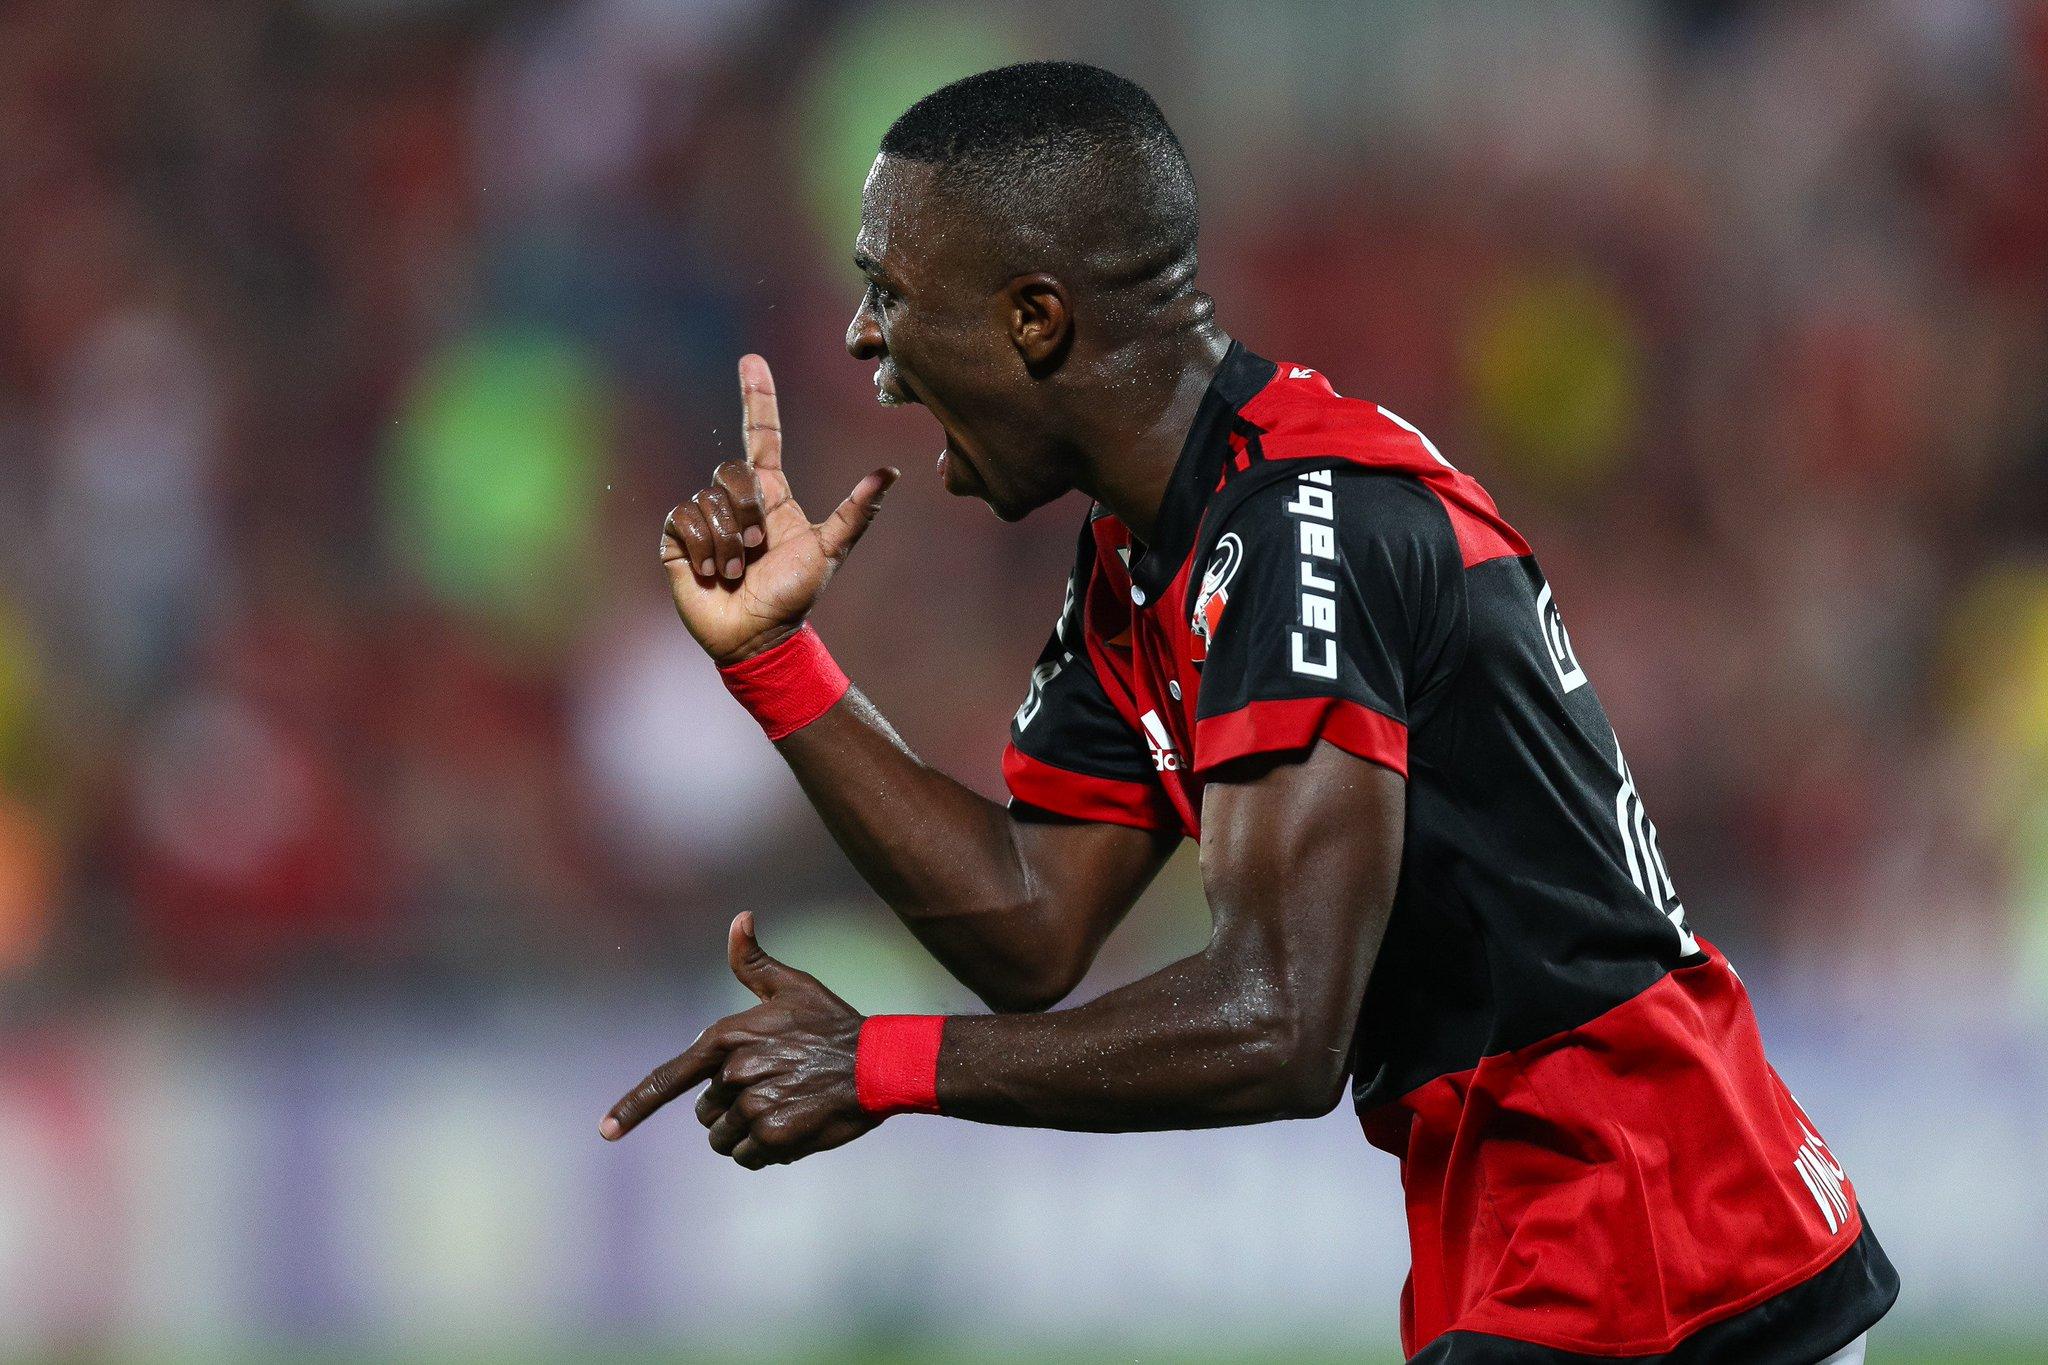 ���� Flamengo wonderkid Vinícius Júnior �� Real Madrid...   Future #UCL star? �� https://t.co/lPg40RrrDF